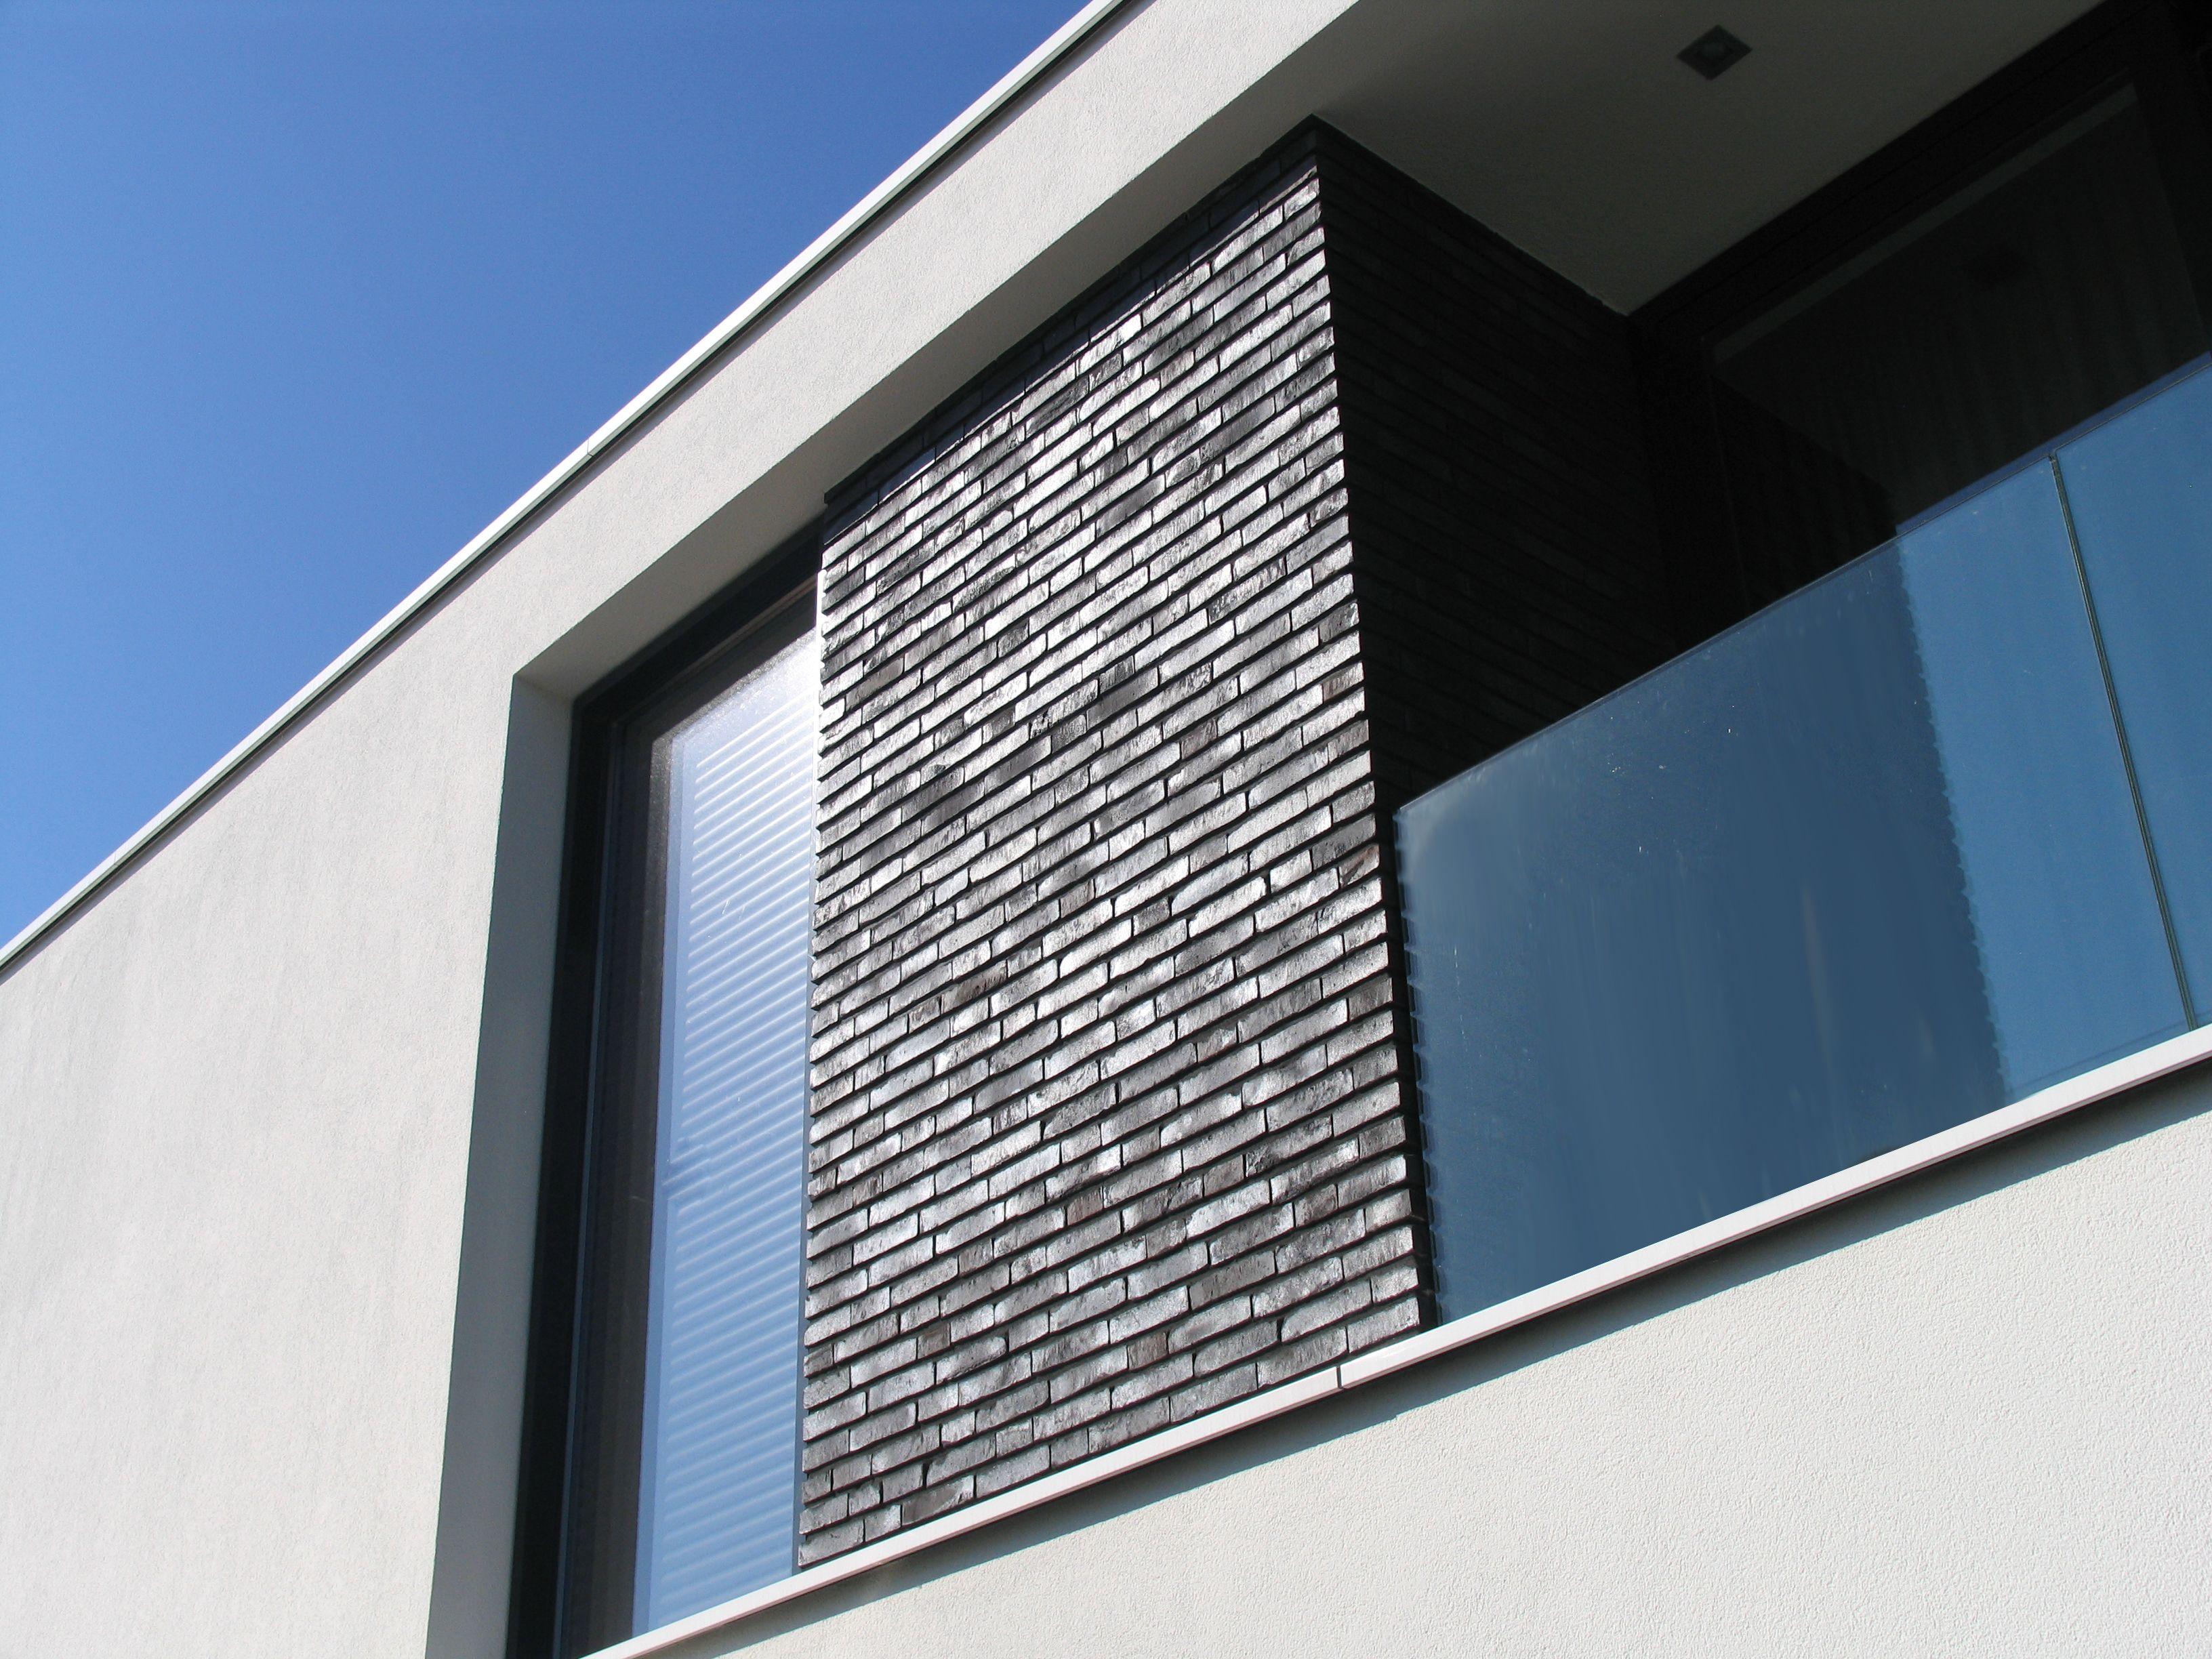 Modern minimalistische woning moderne villa in wit stucwerk met donkere metselwerk accenten - Moderne kleur huis ...